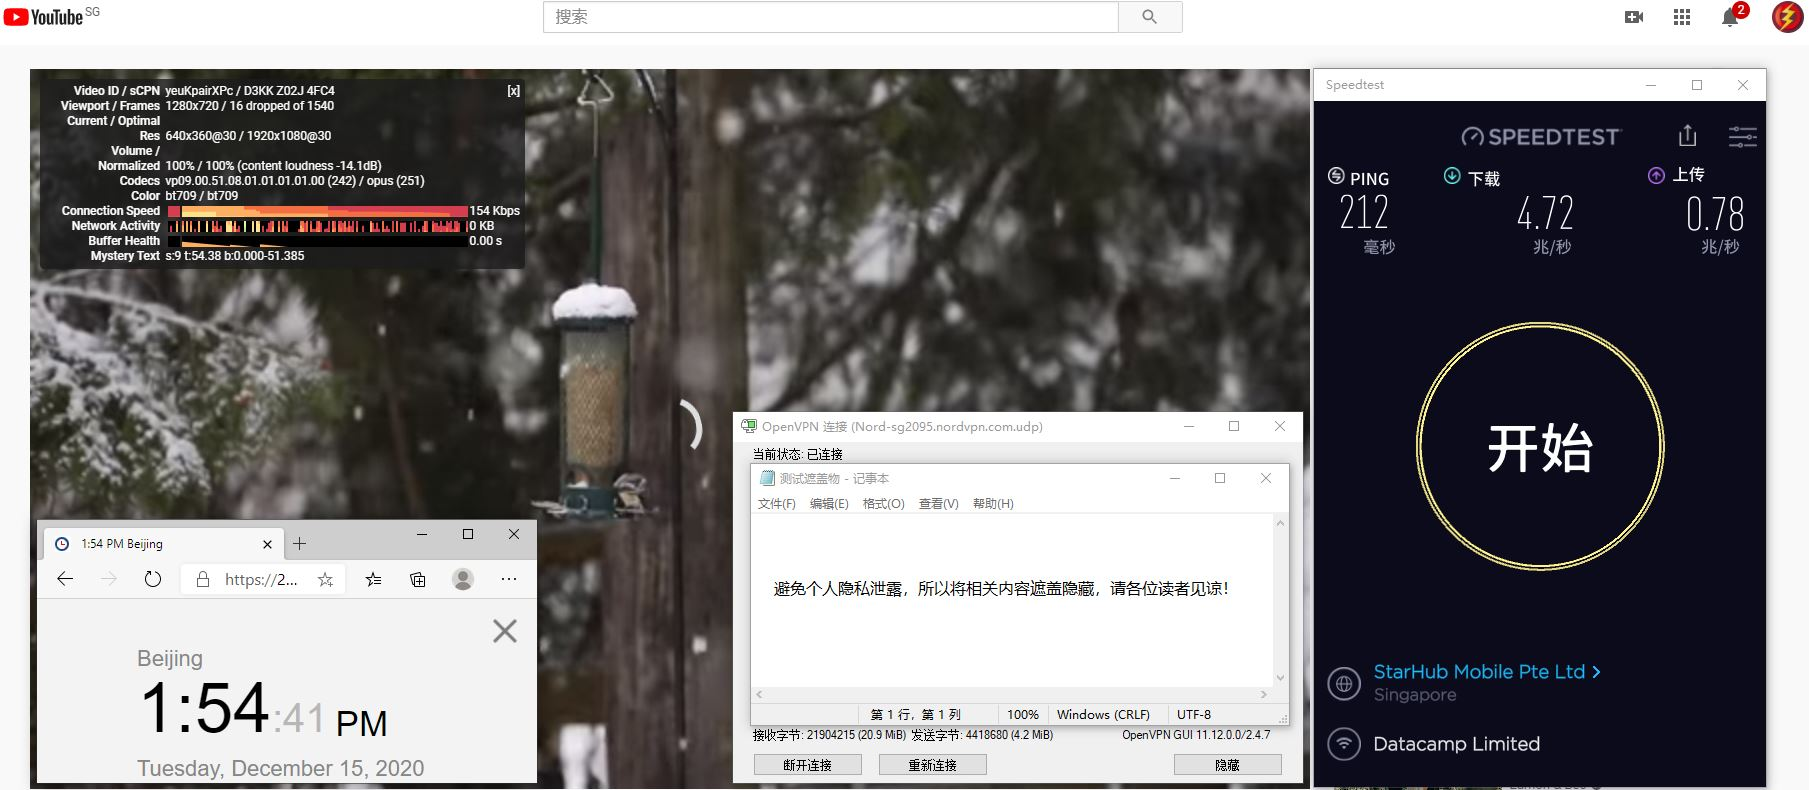 Windows10 NordVPN OpenVPN Gui SG2095 服务器 中国VPN 翻墙 科学上网 测试 - 20201215